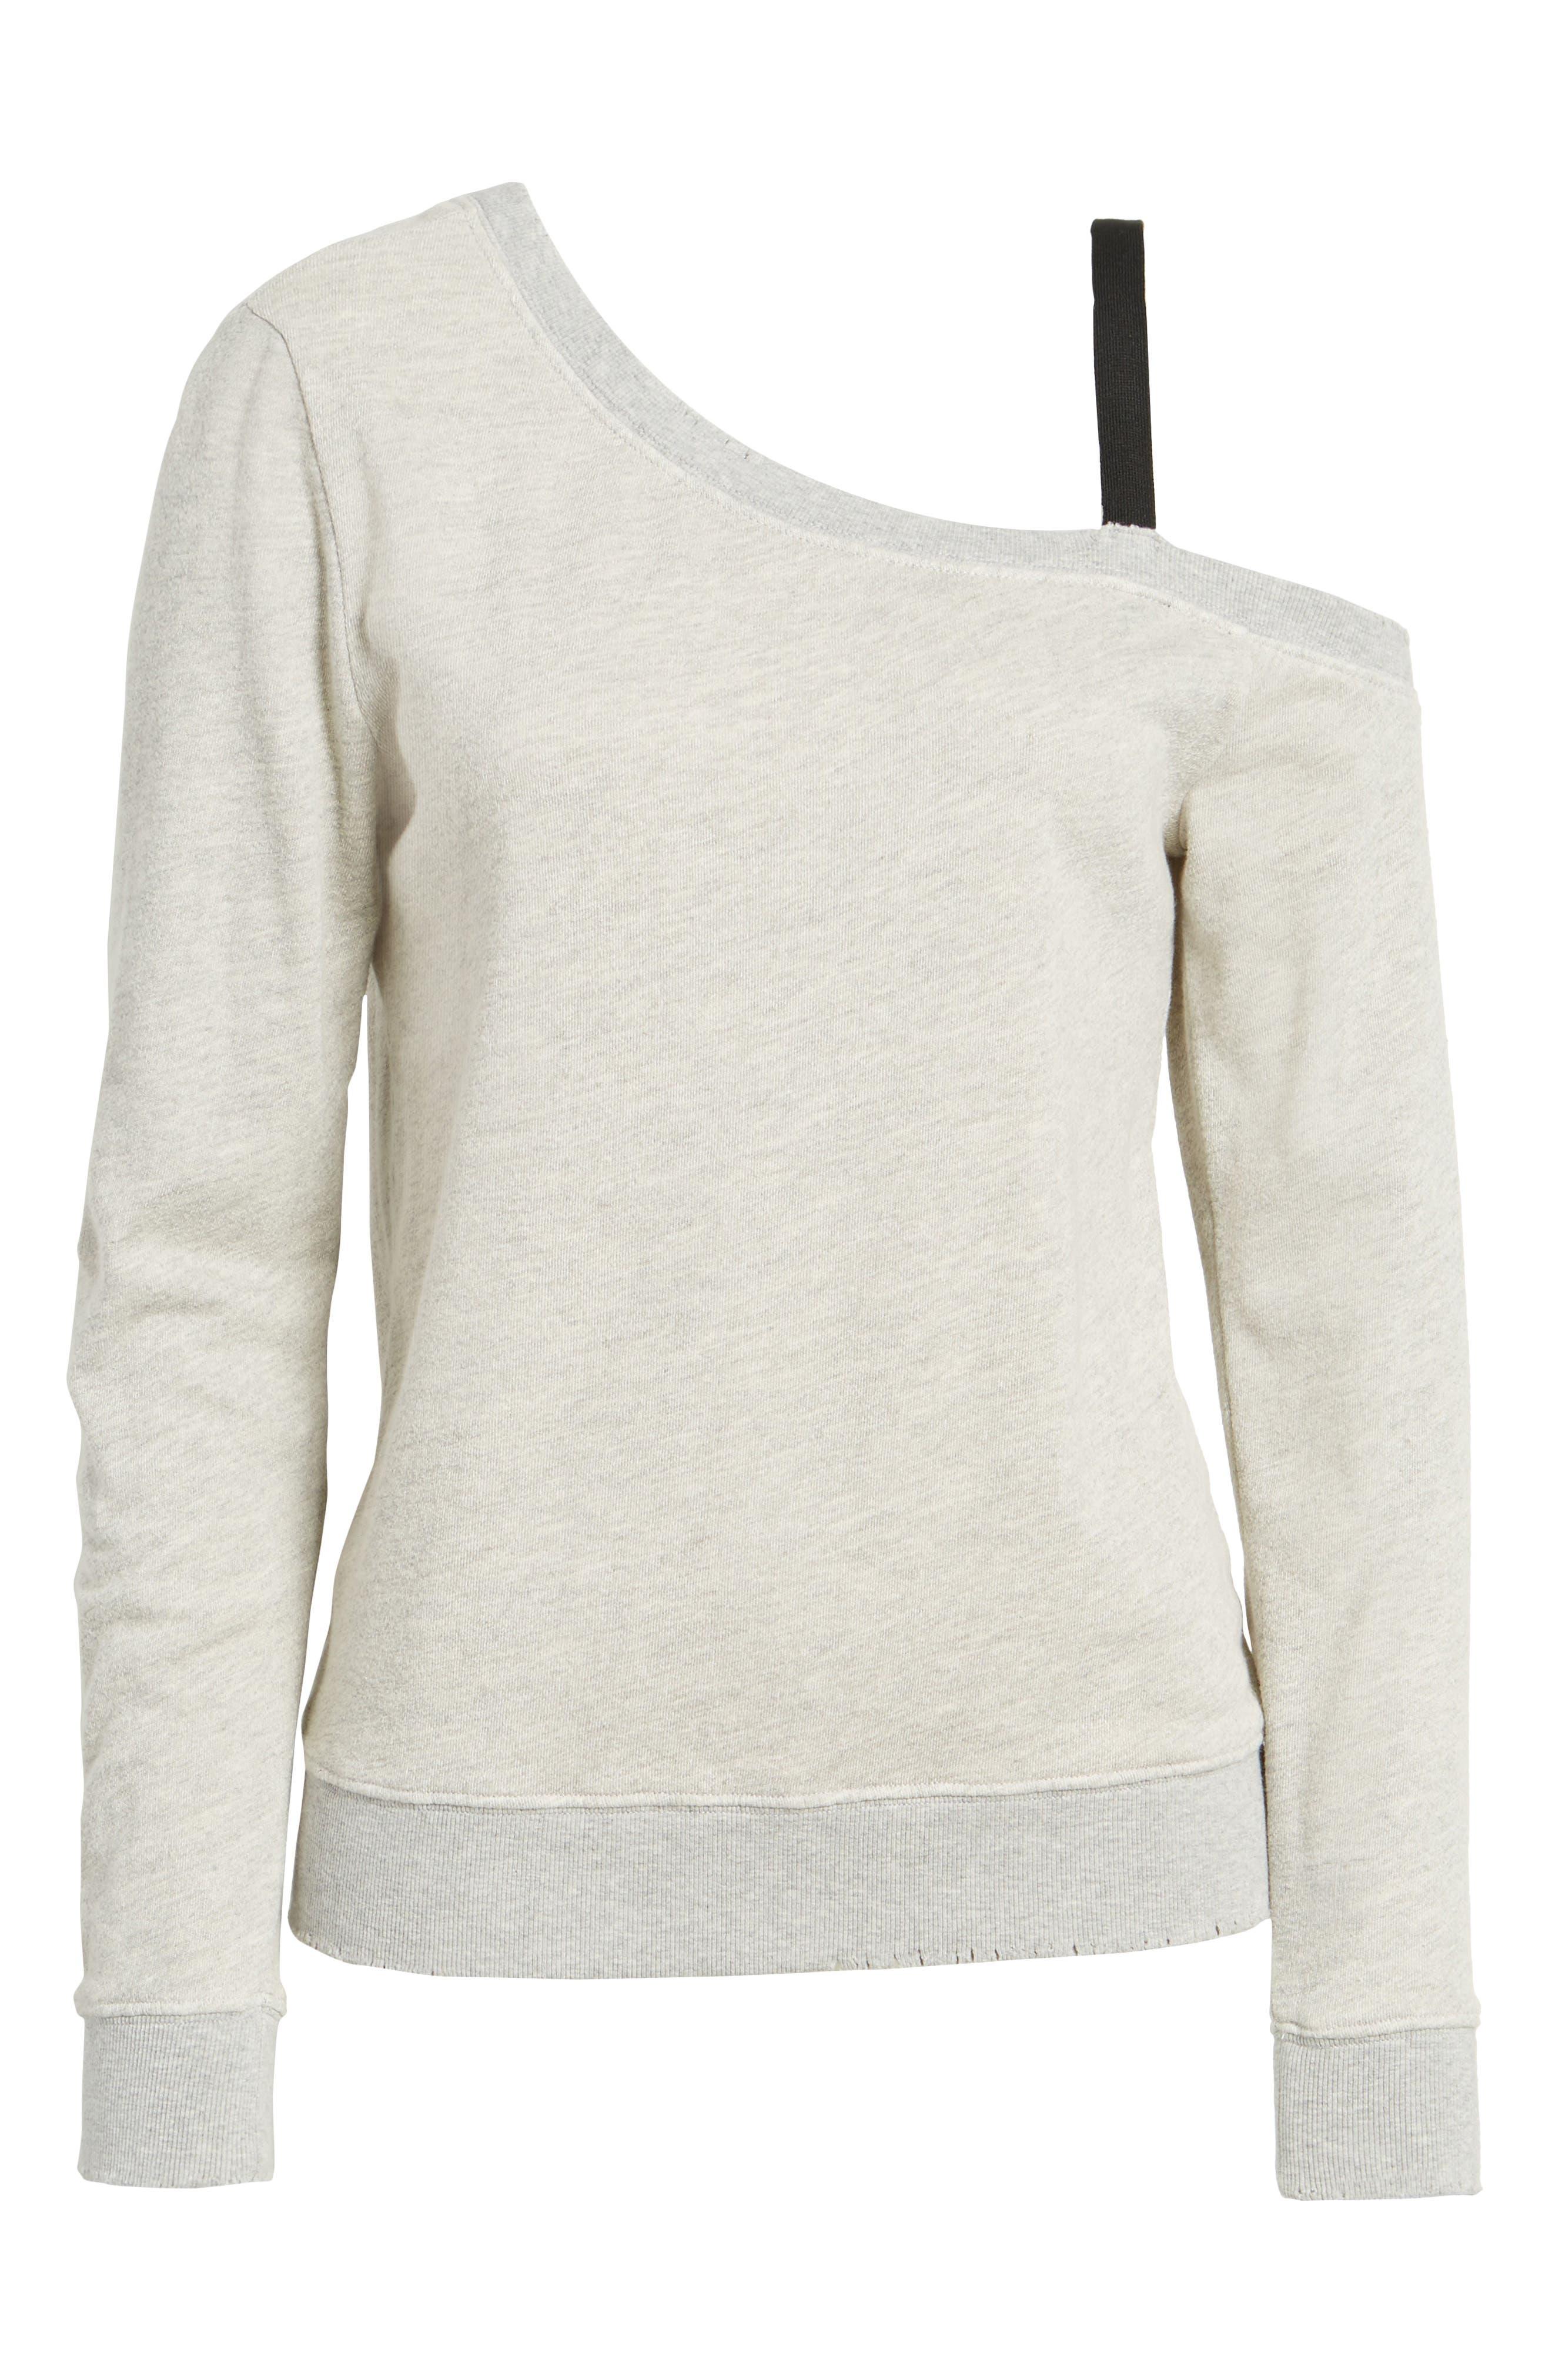 One-Shoulder Sweatshirt,                             Alternate thumbnail 6, color,